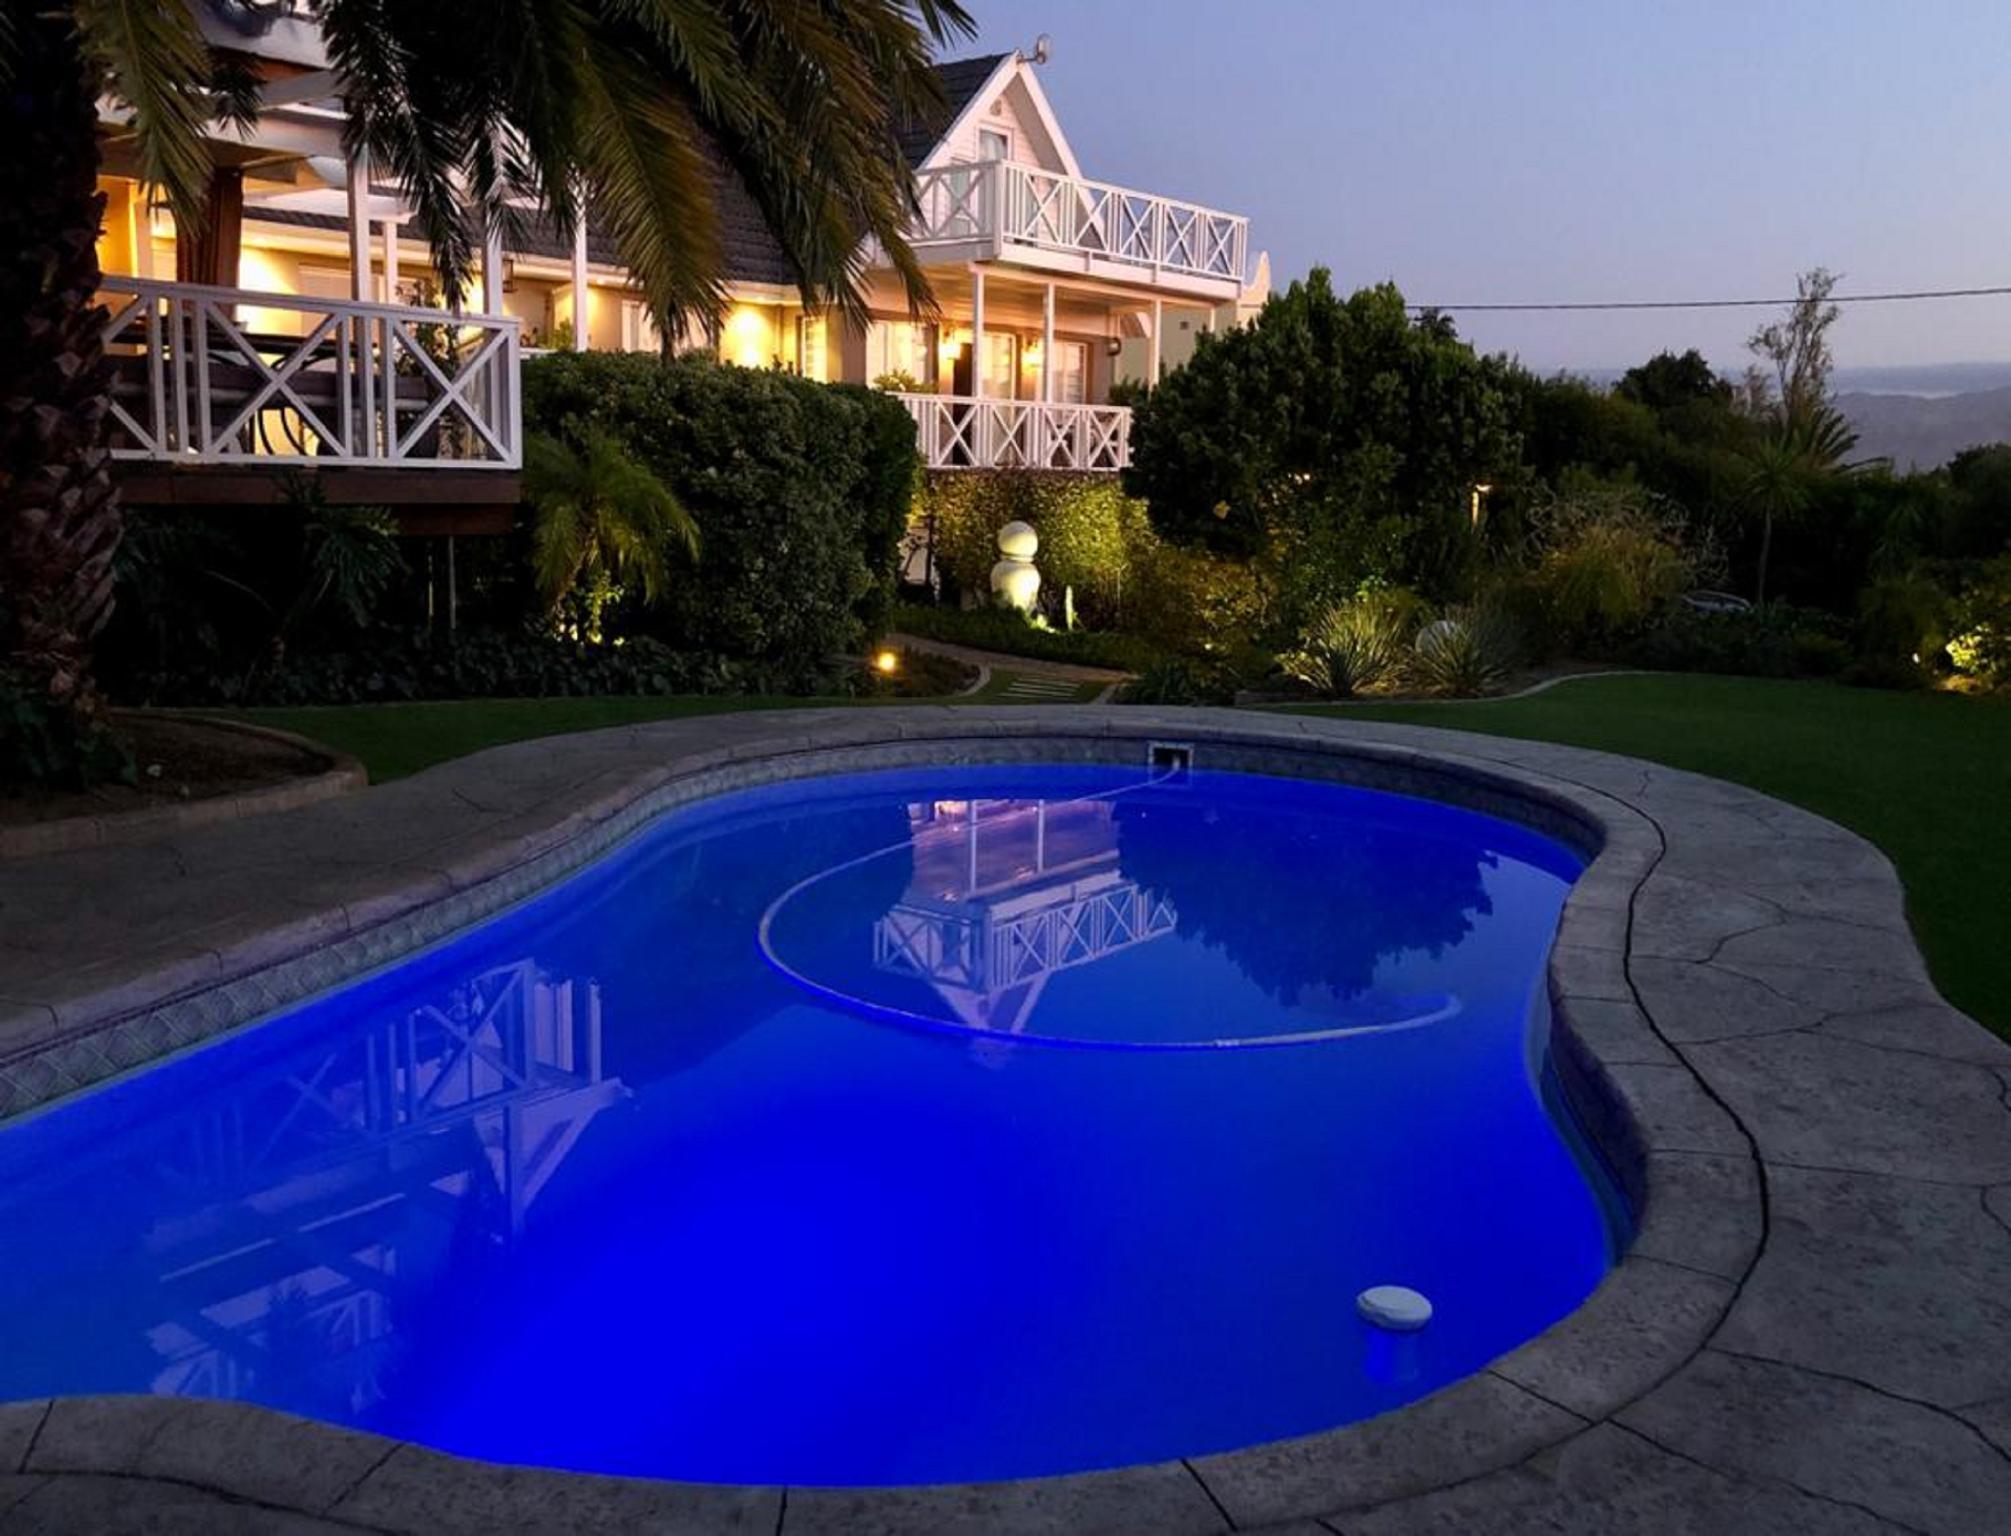 Berrydel LifeStyle Guest House